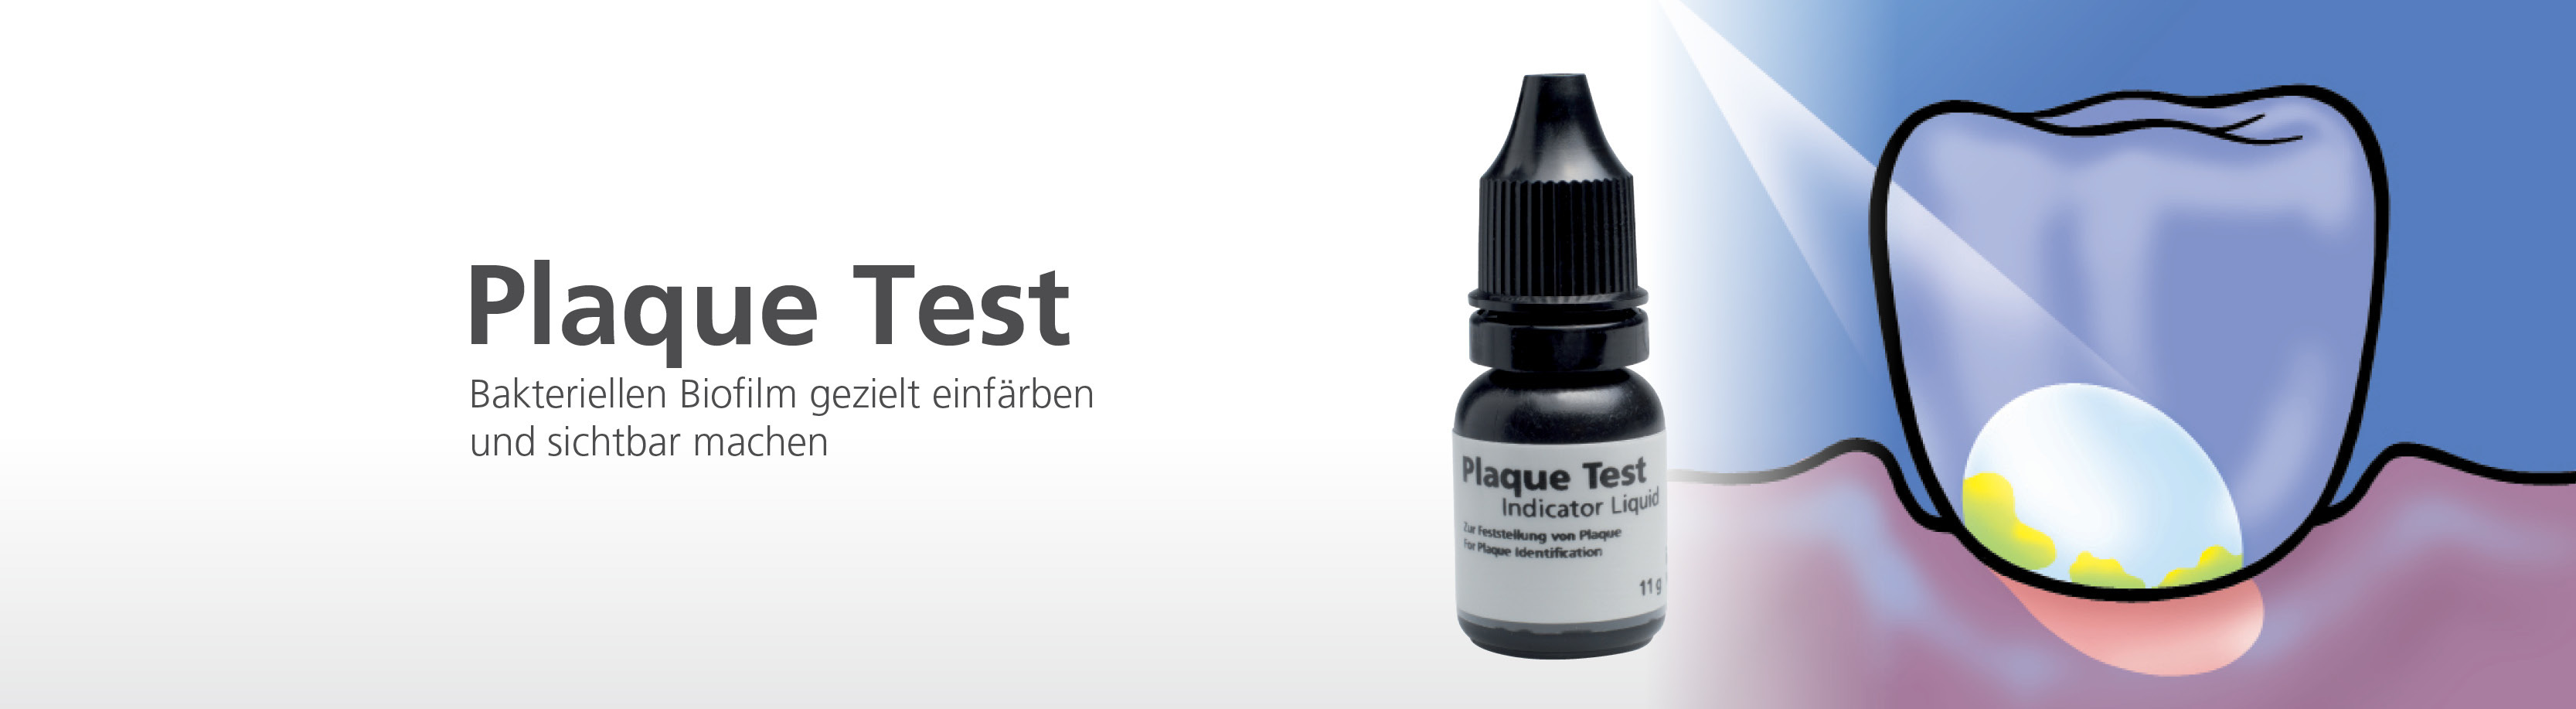 9515348295710_plaque-testde_plaque-test.jpg